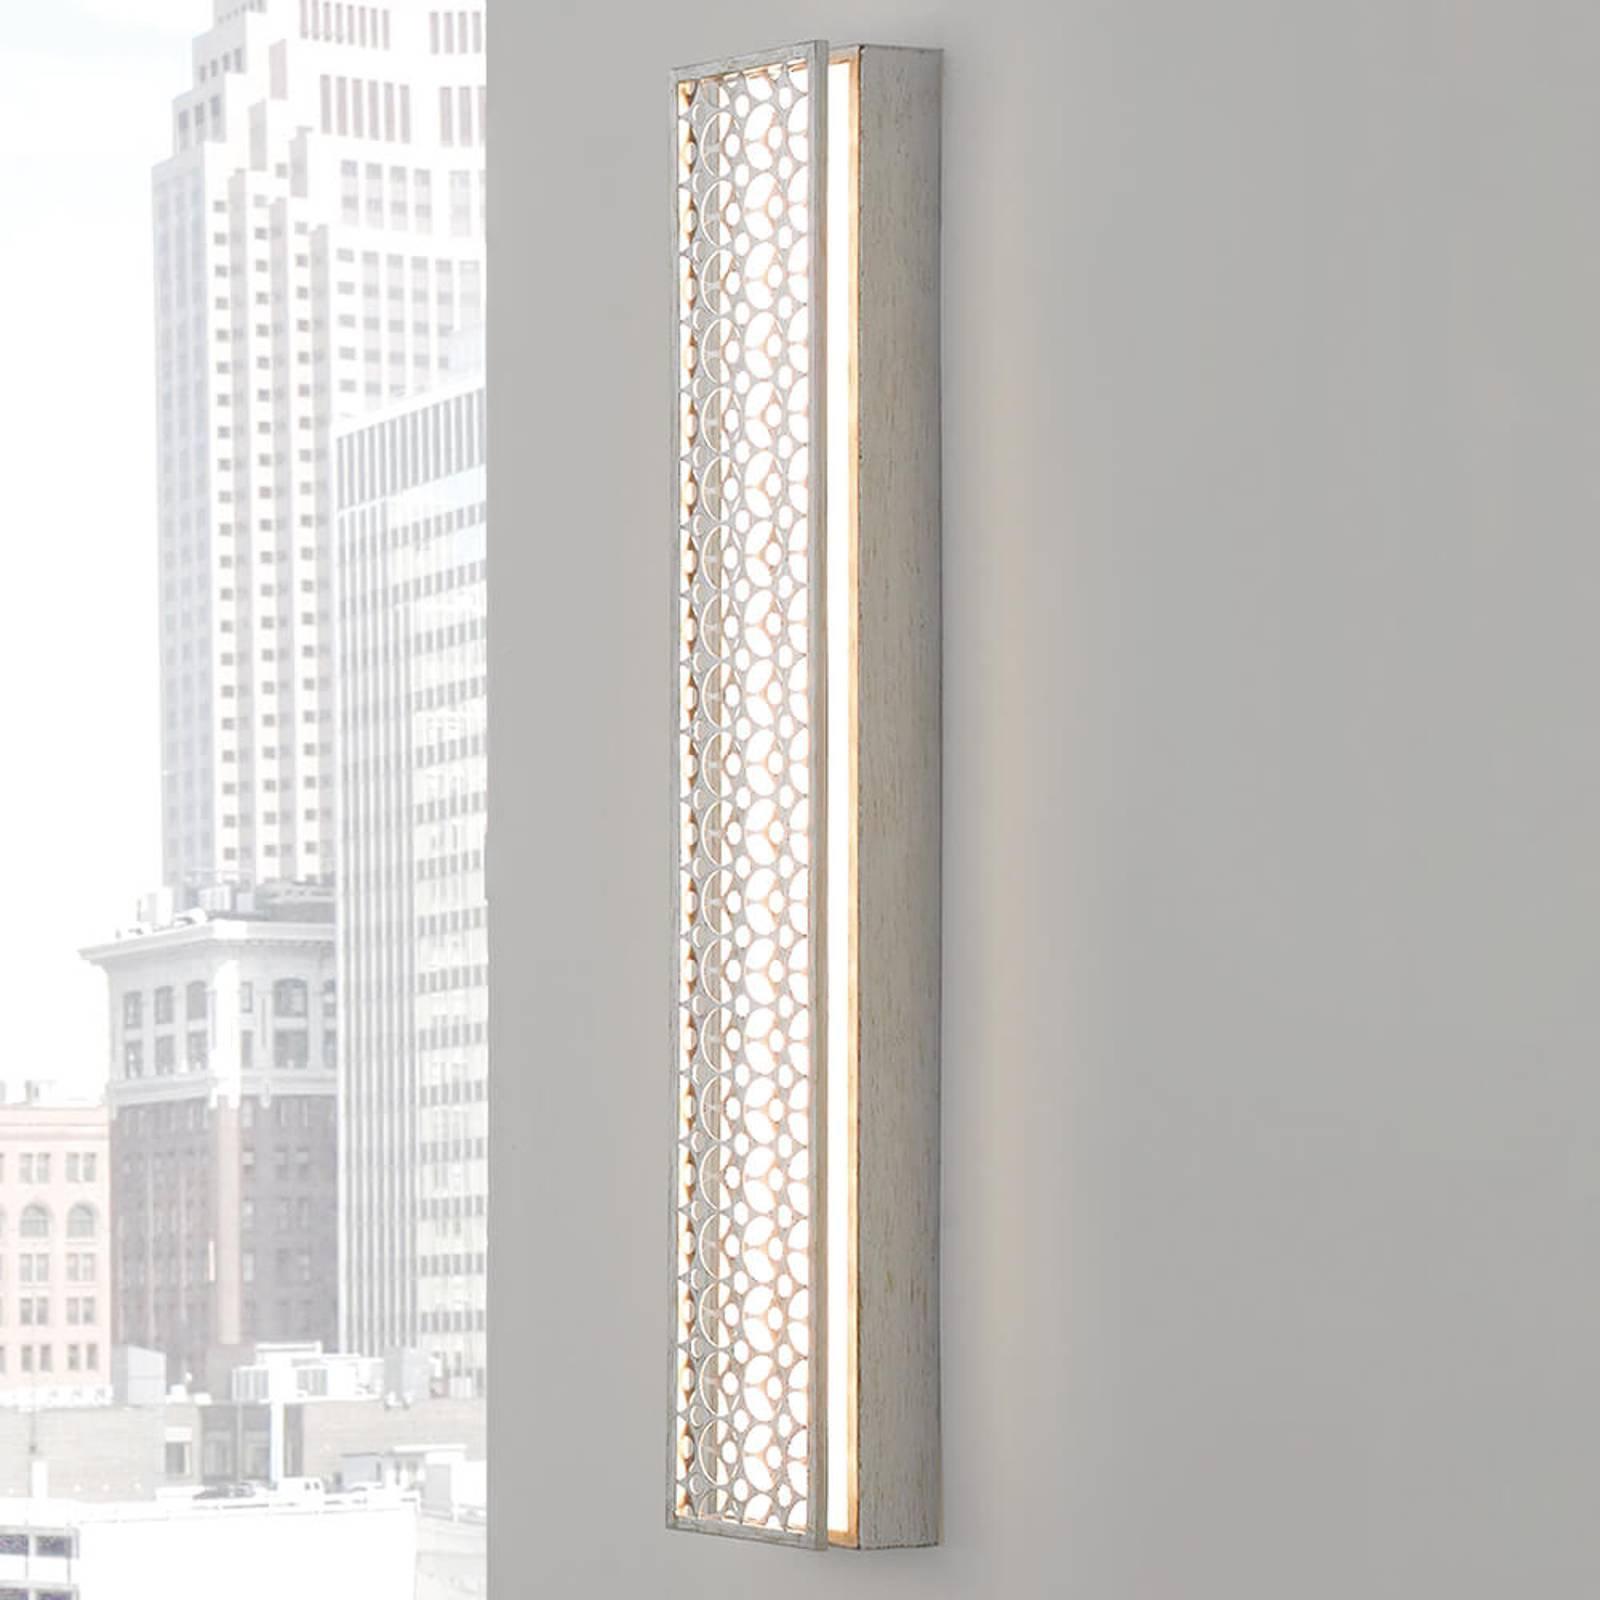 Avlang LED-vegglampe Kenney